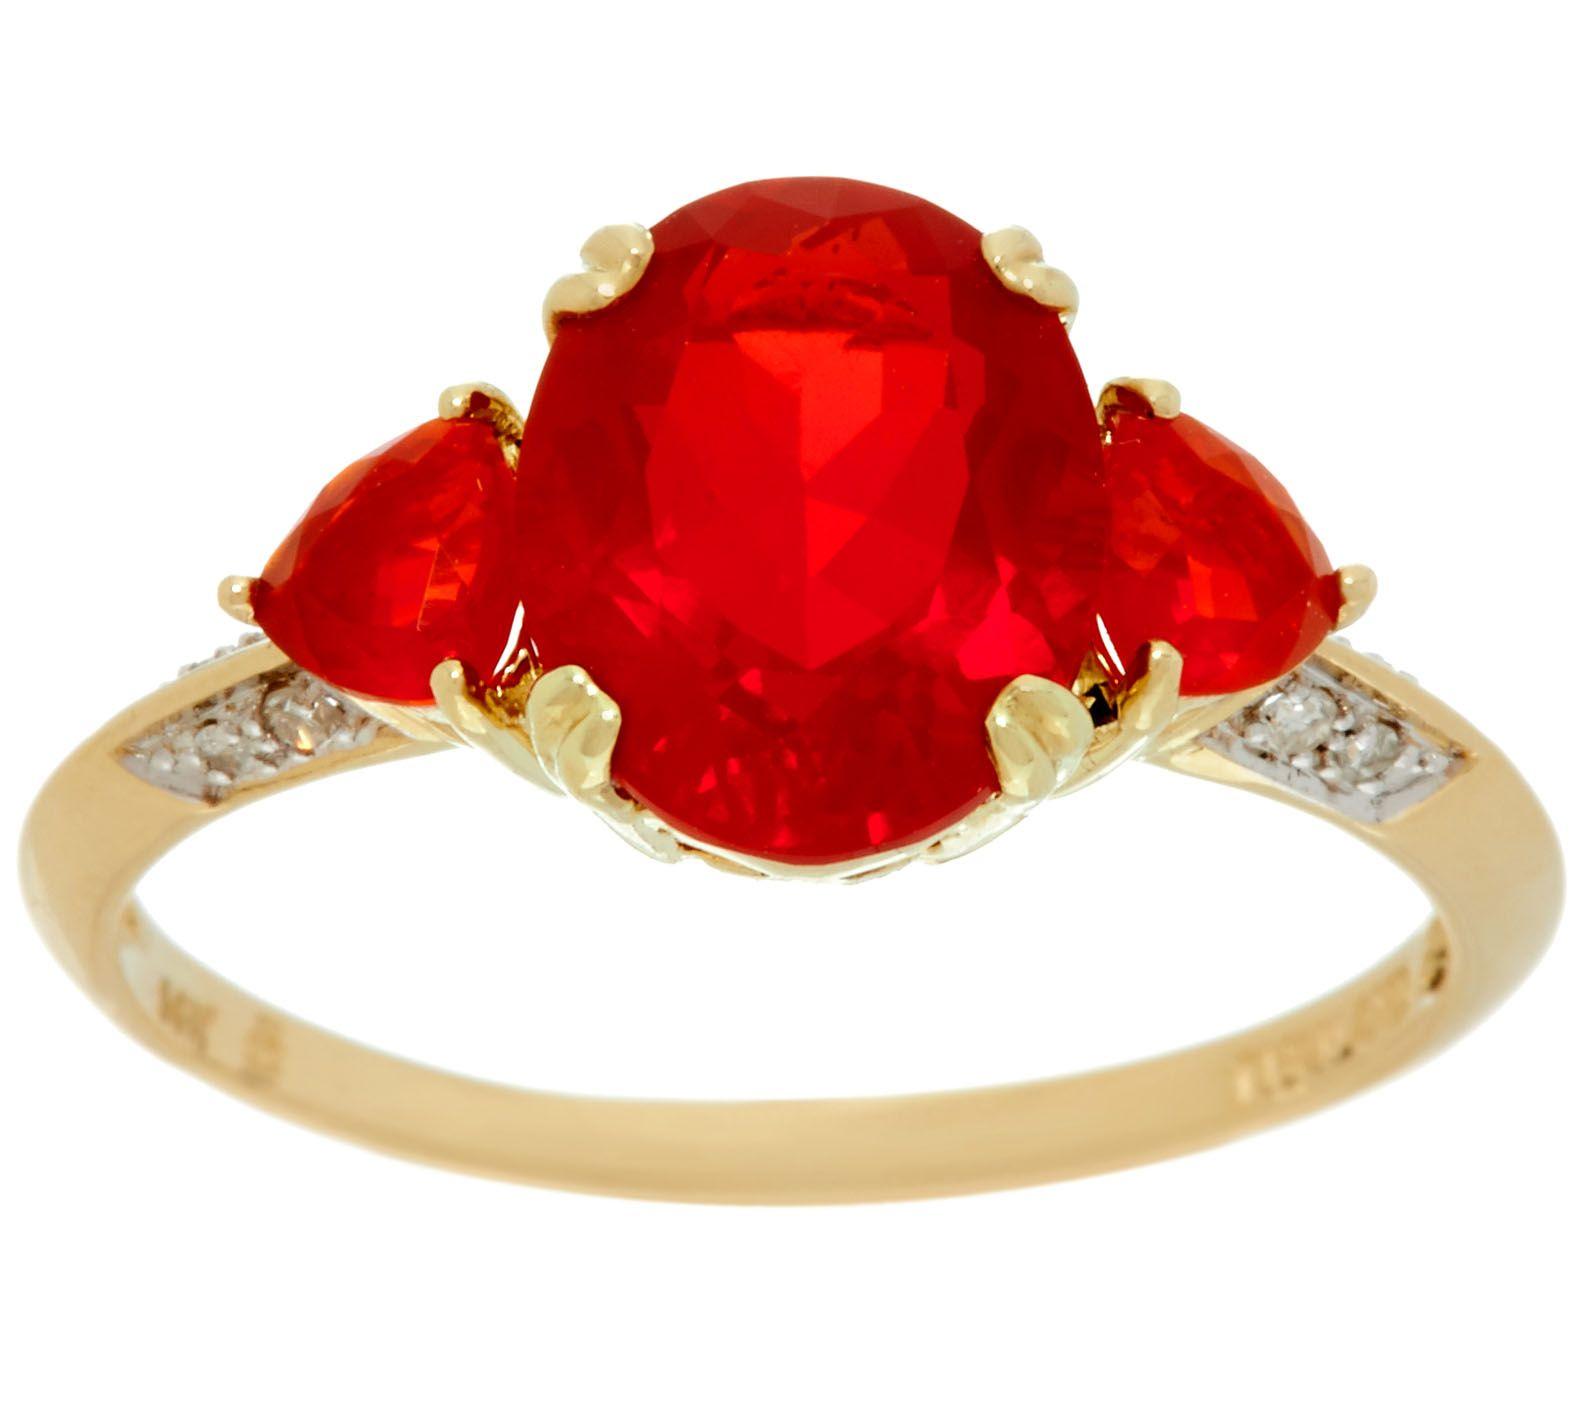 Mexican Fire Opal & Diamond 3-Stone Ring 14K, 2.00 cttw ...  Mexican Fire Op...